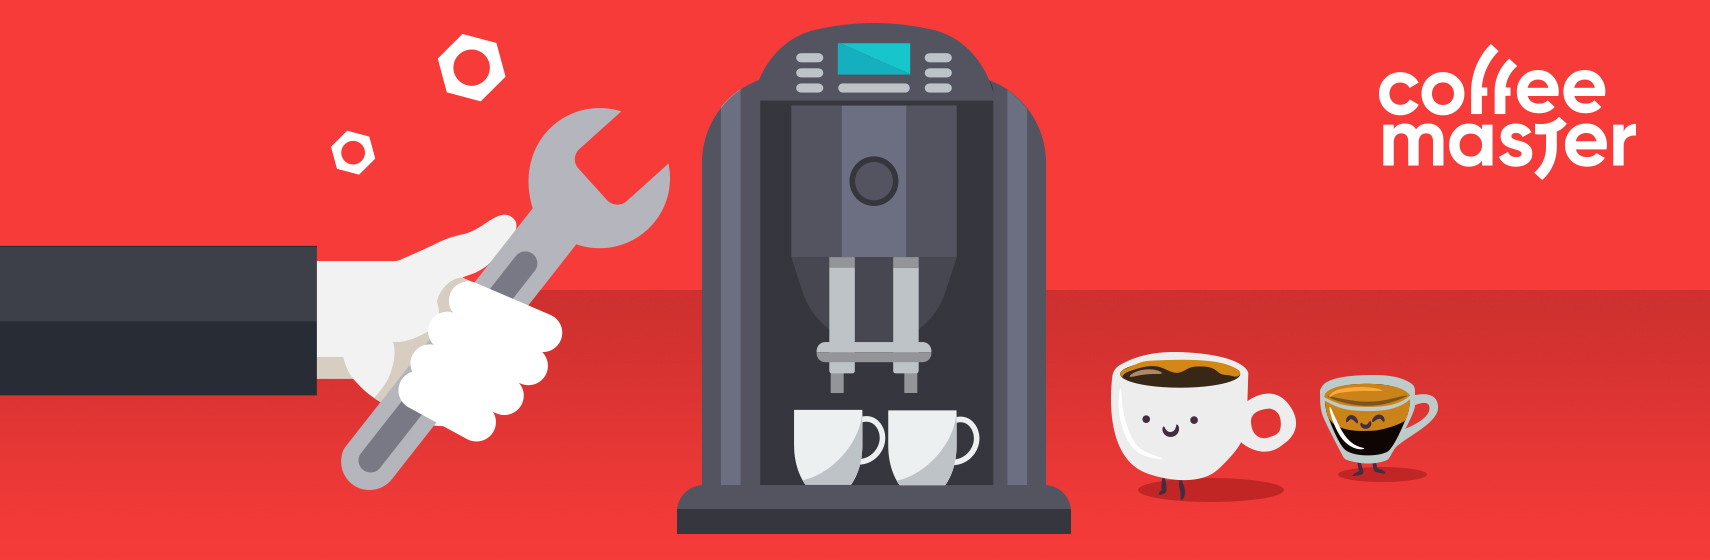 coffemaster-page-banner-repair